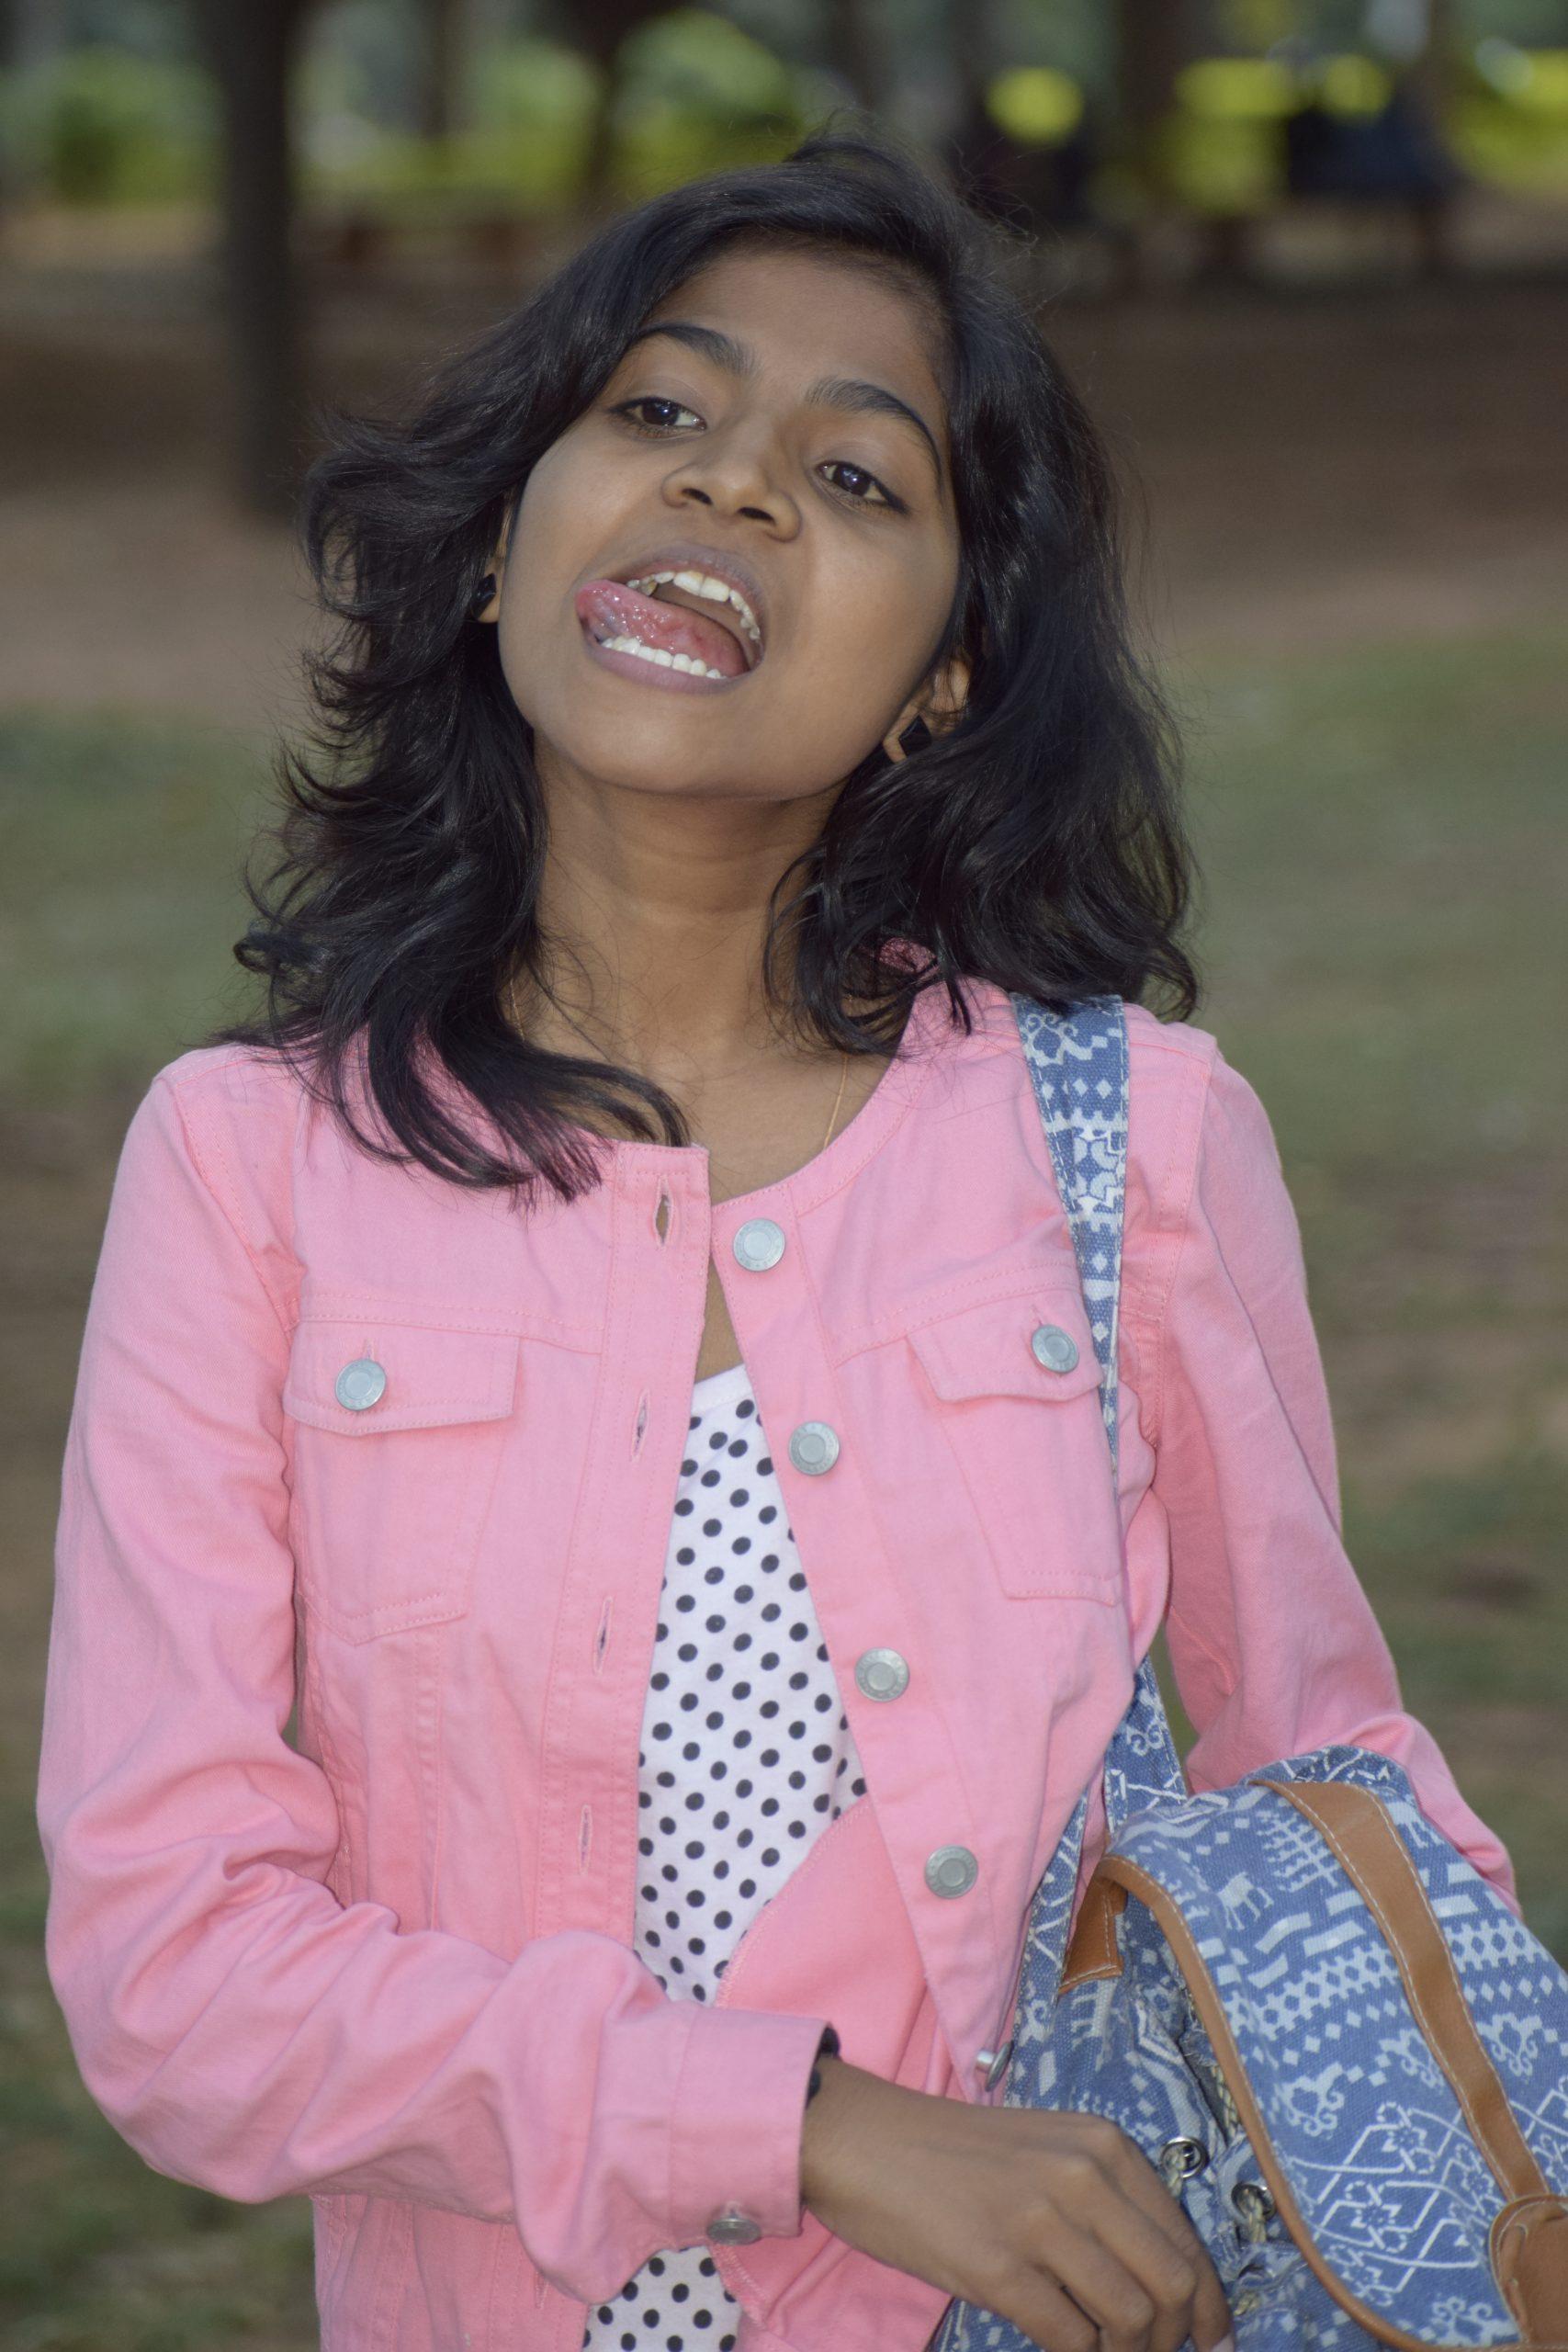 Indian girl licking